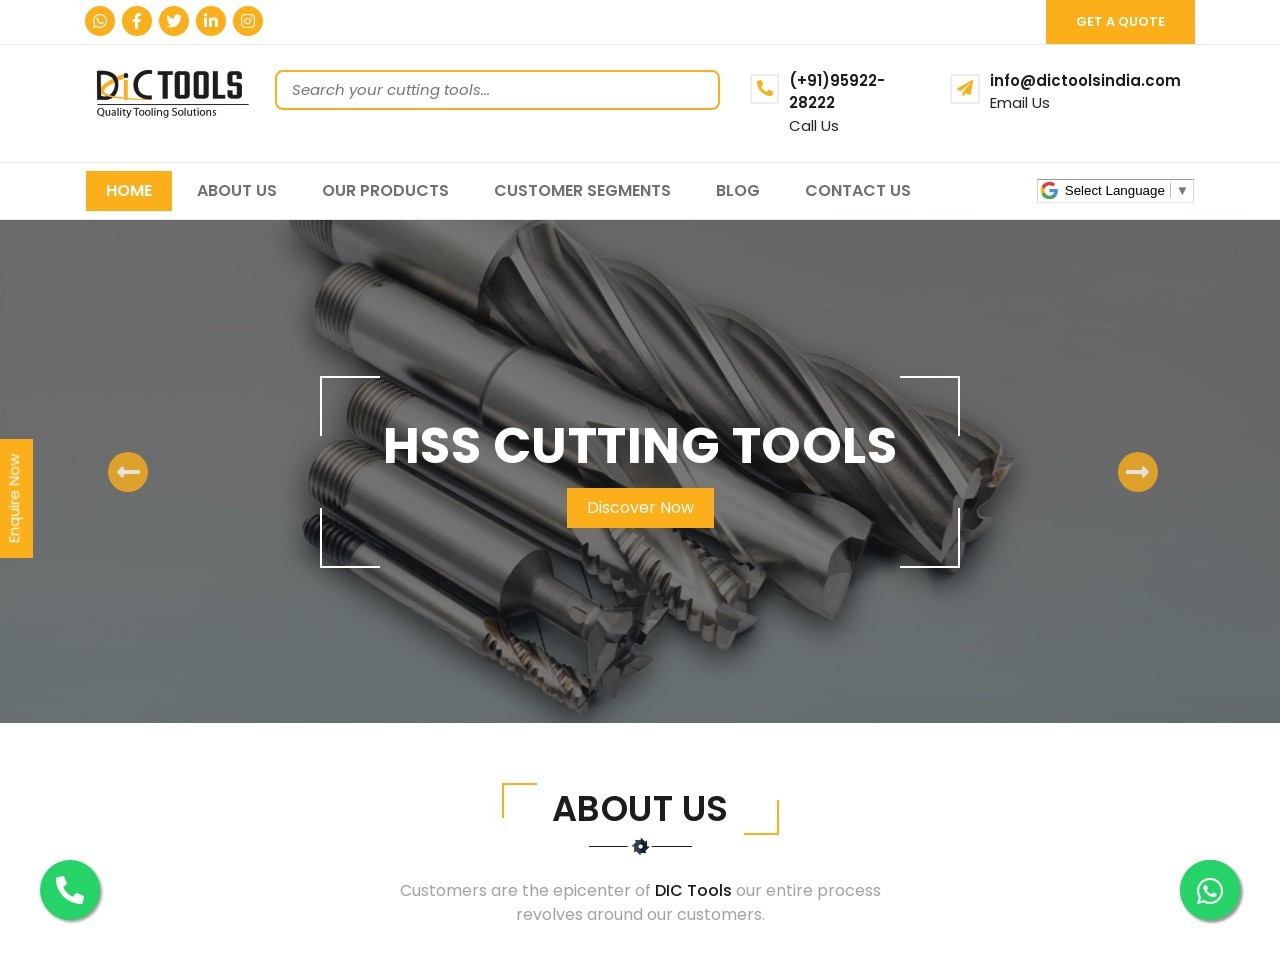 TCT Annular Cutter With Fein Shank | TCT Annular Cutters Suppliers